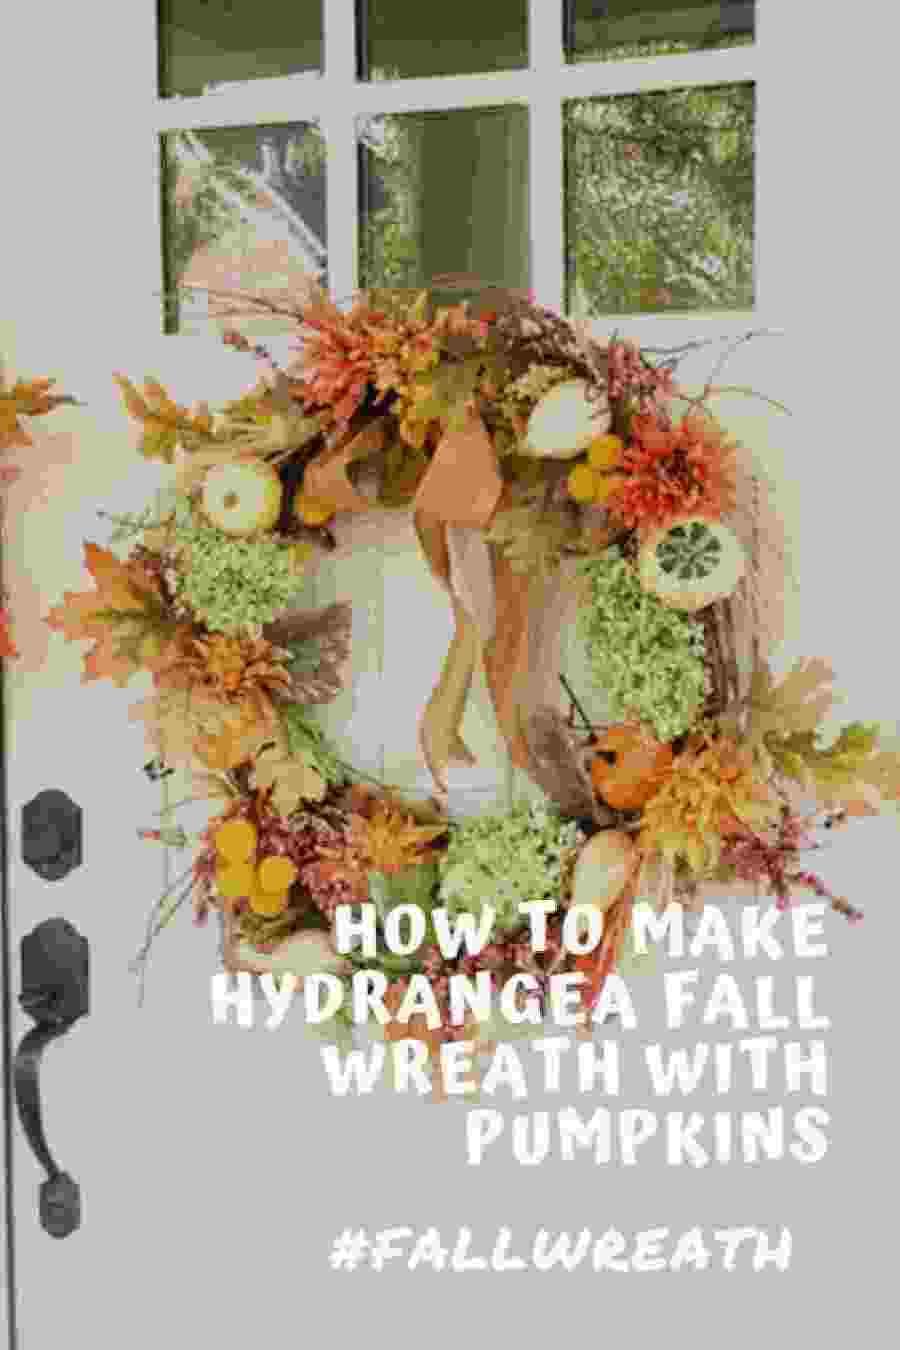 Hydrangea Fall Wreath with Pumpkins